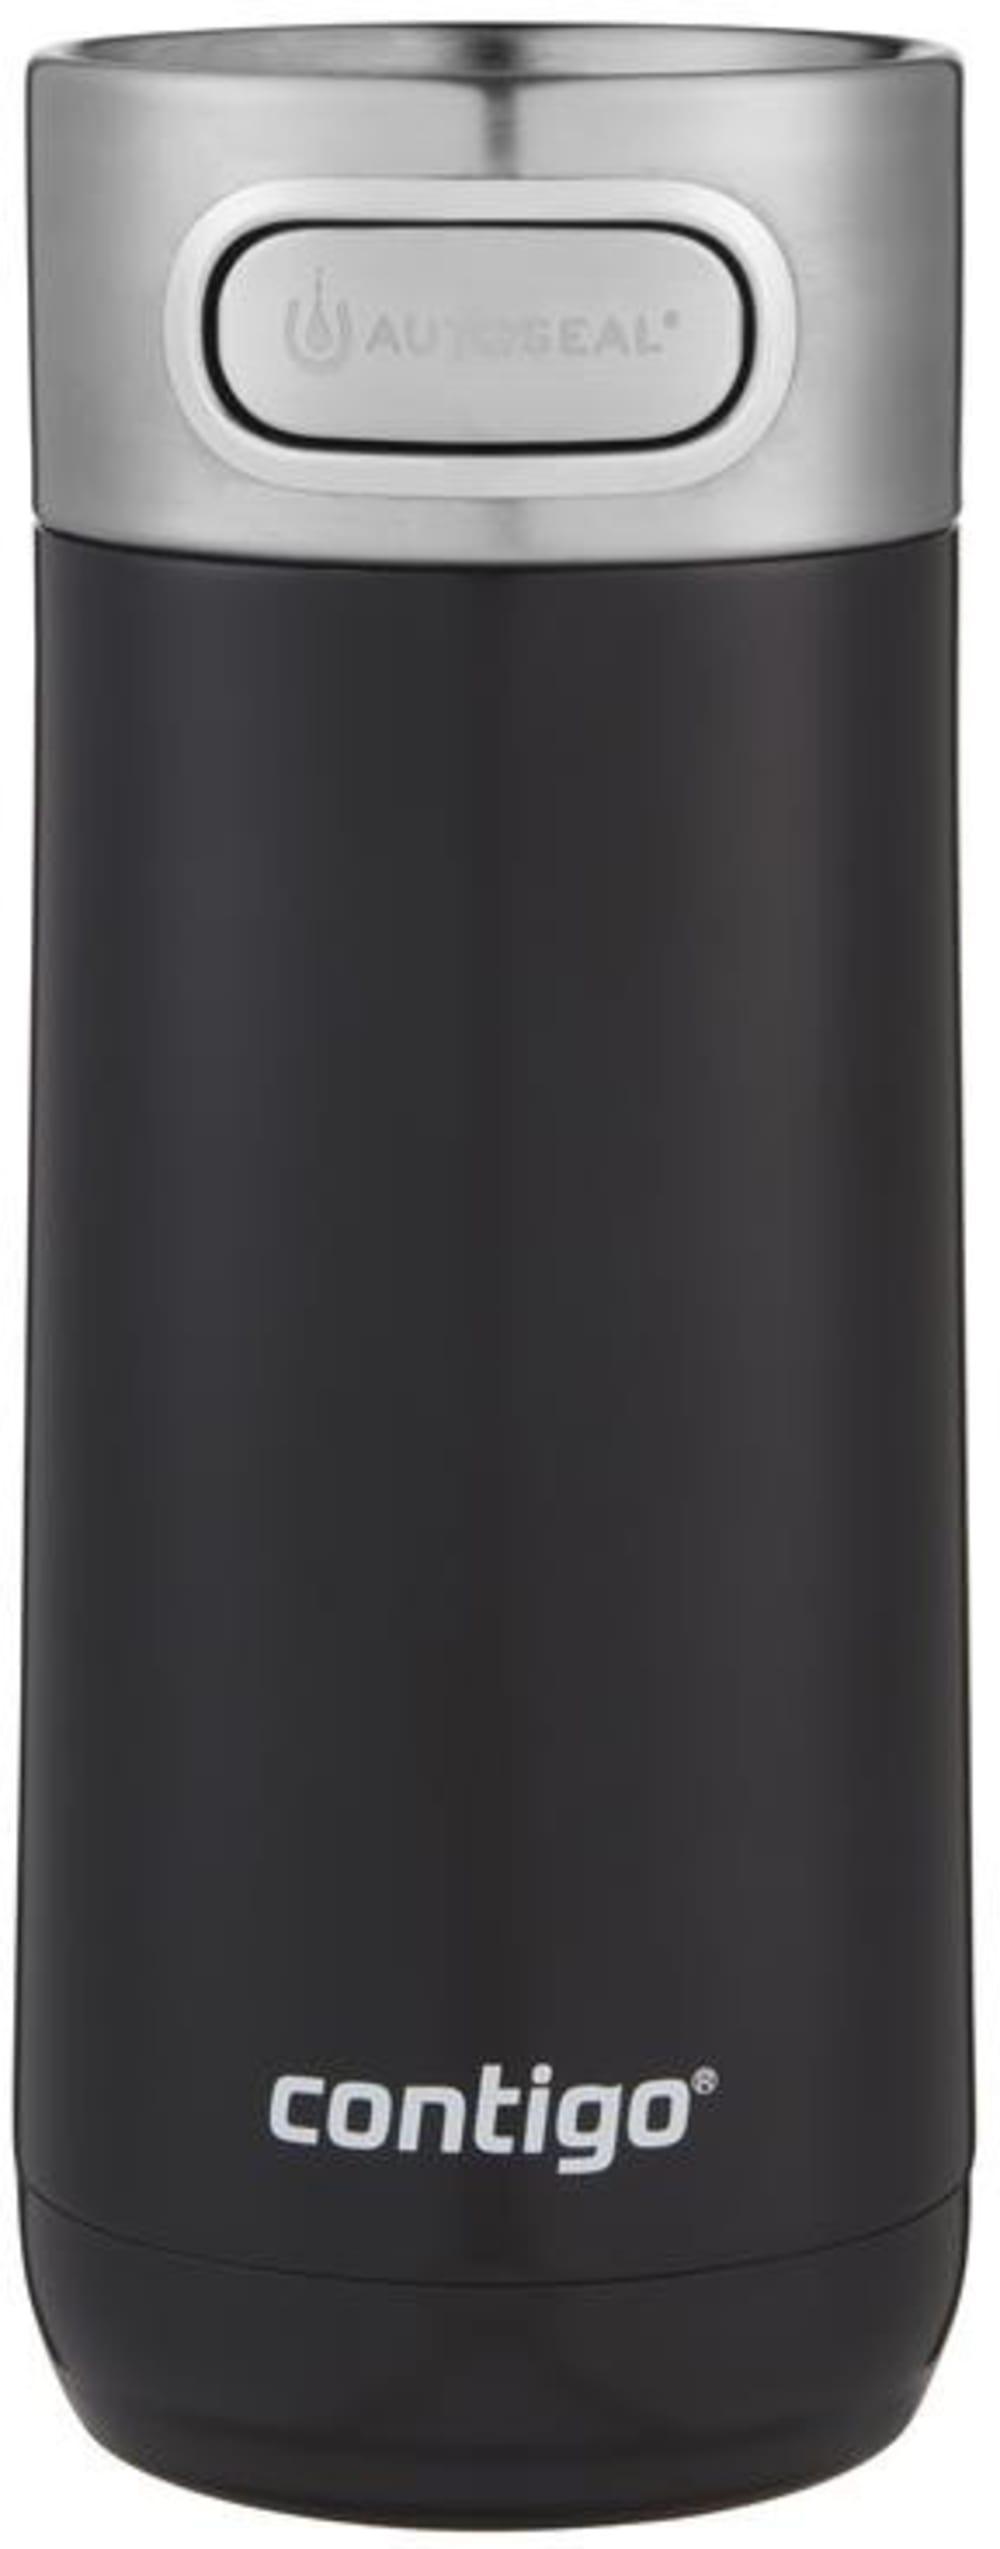 Kubek termiczny Luxe Vacuum Insulated Autoseal licorice 360 ml